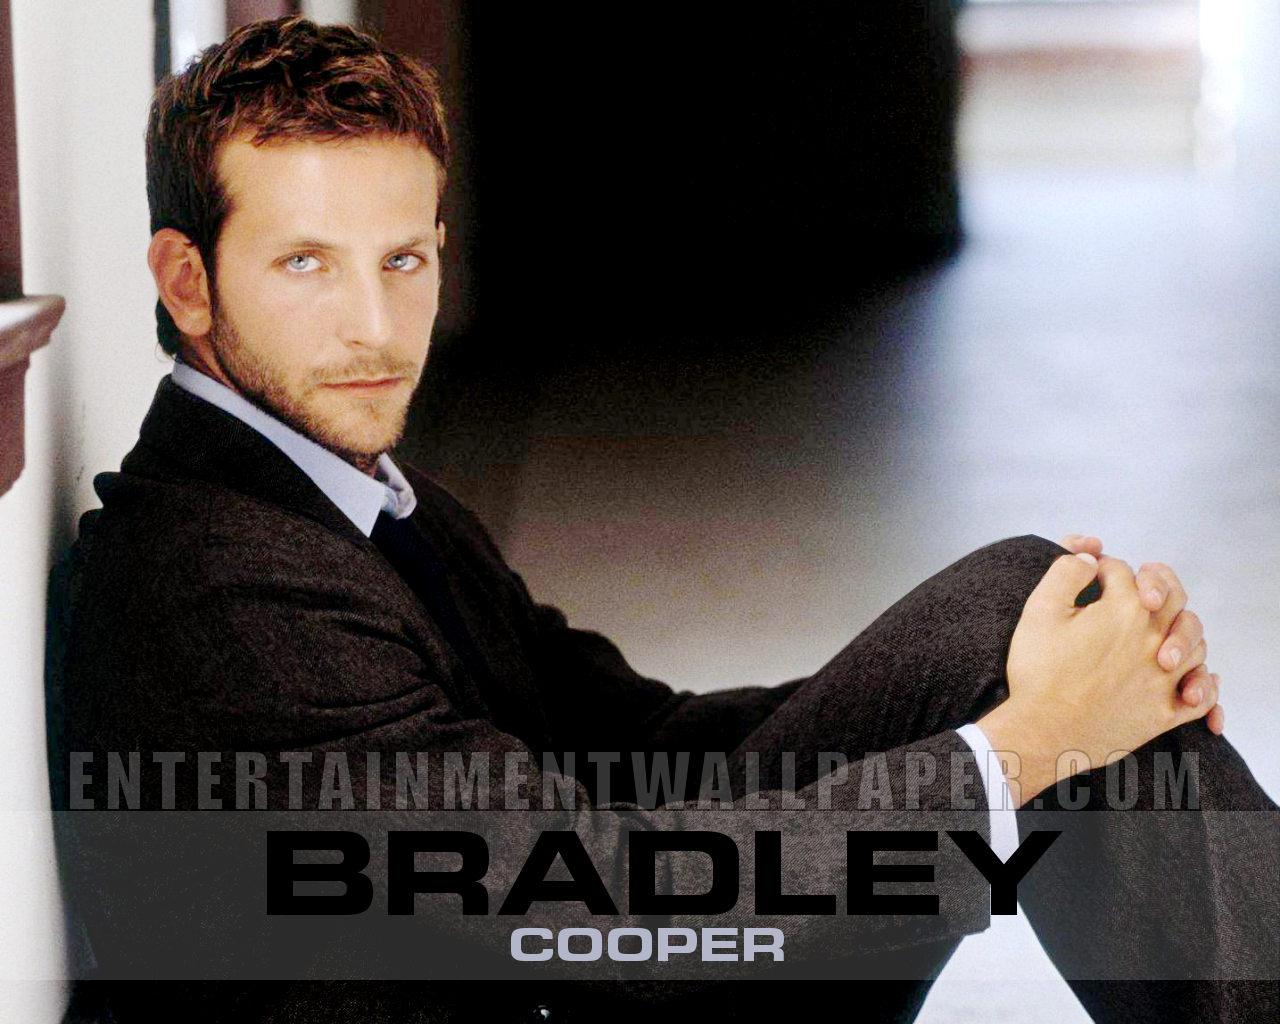 bradley cooper   Bradley Cooper Wallpaper 23904492 1280x1024